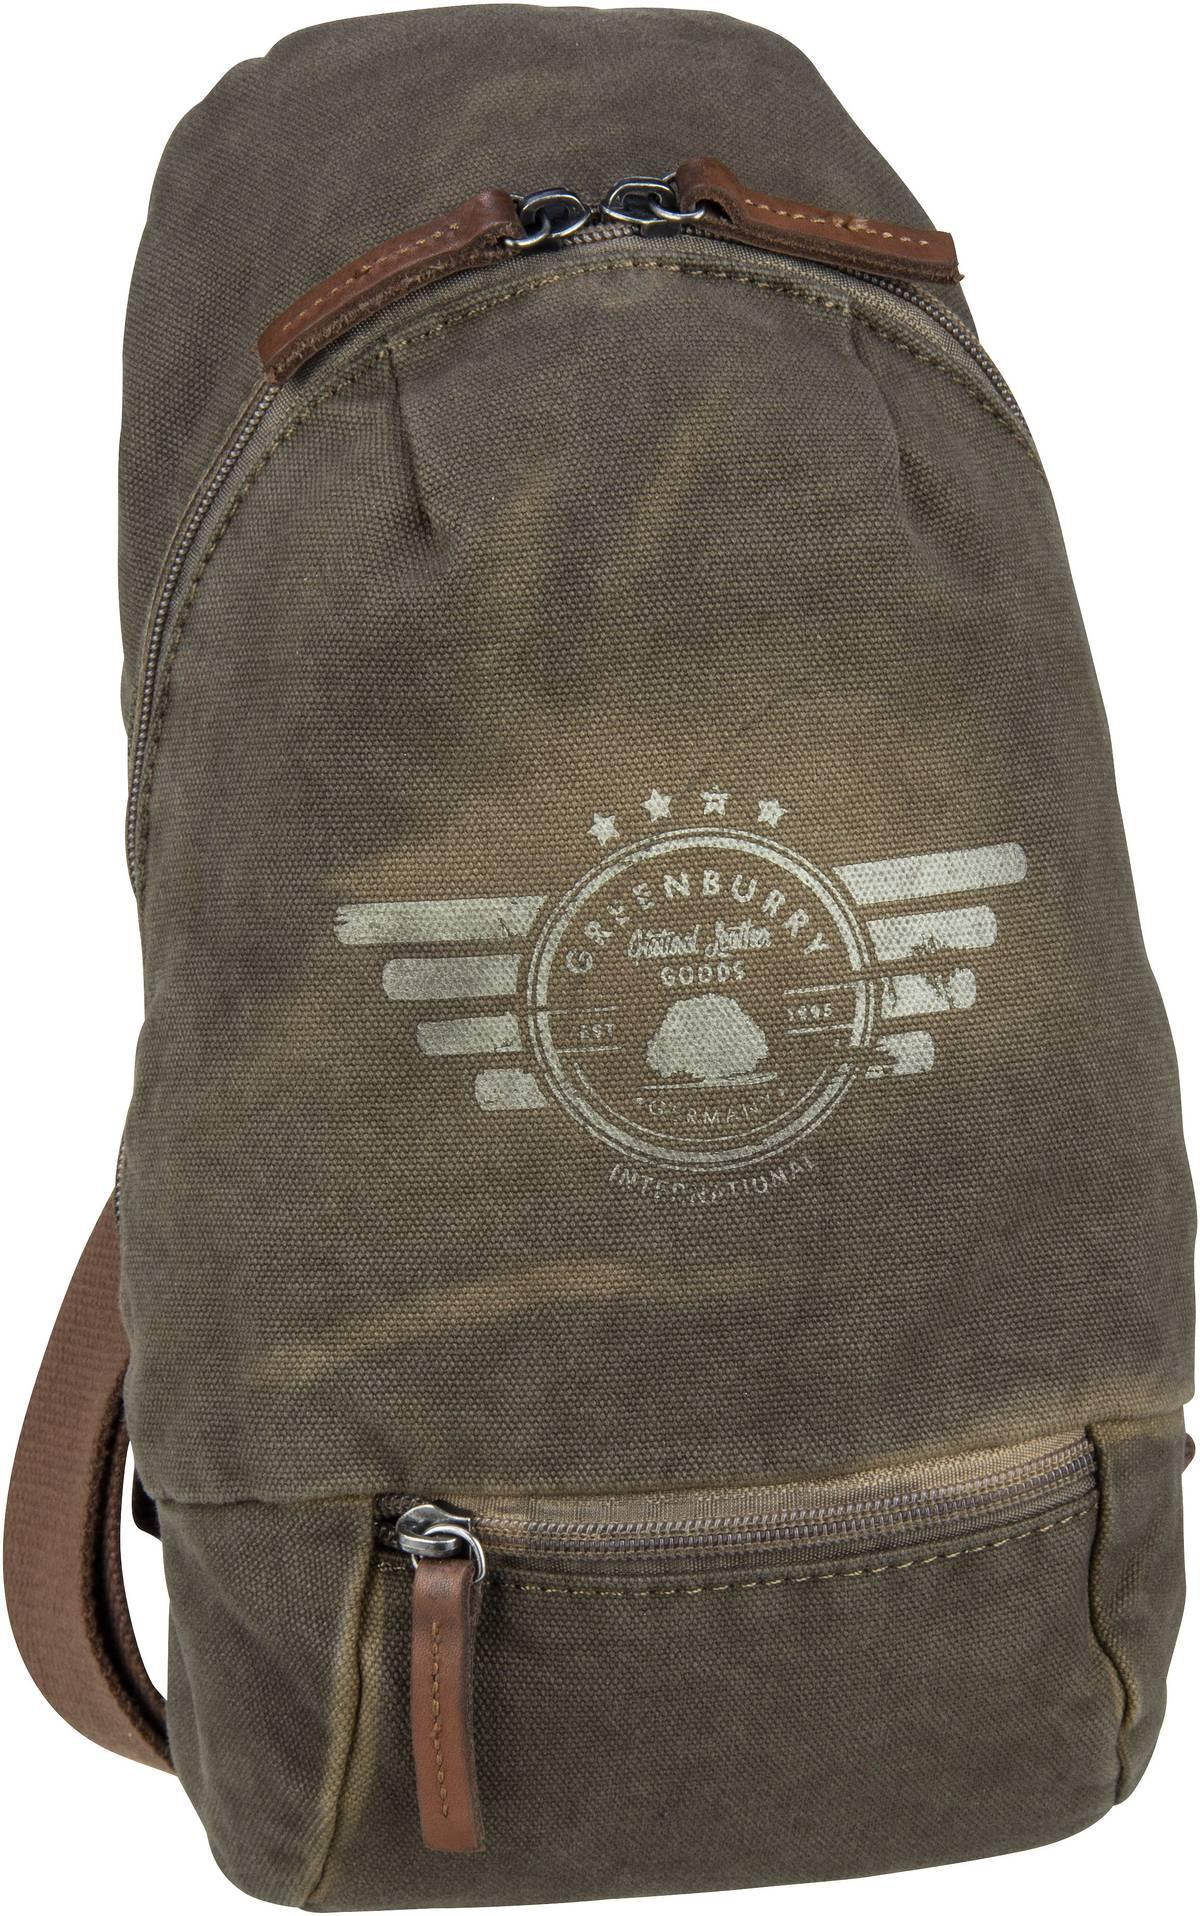 Rucksack / Daypack Vintage Aviator 5910 Khaki